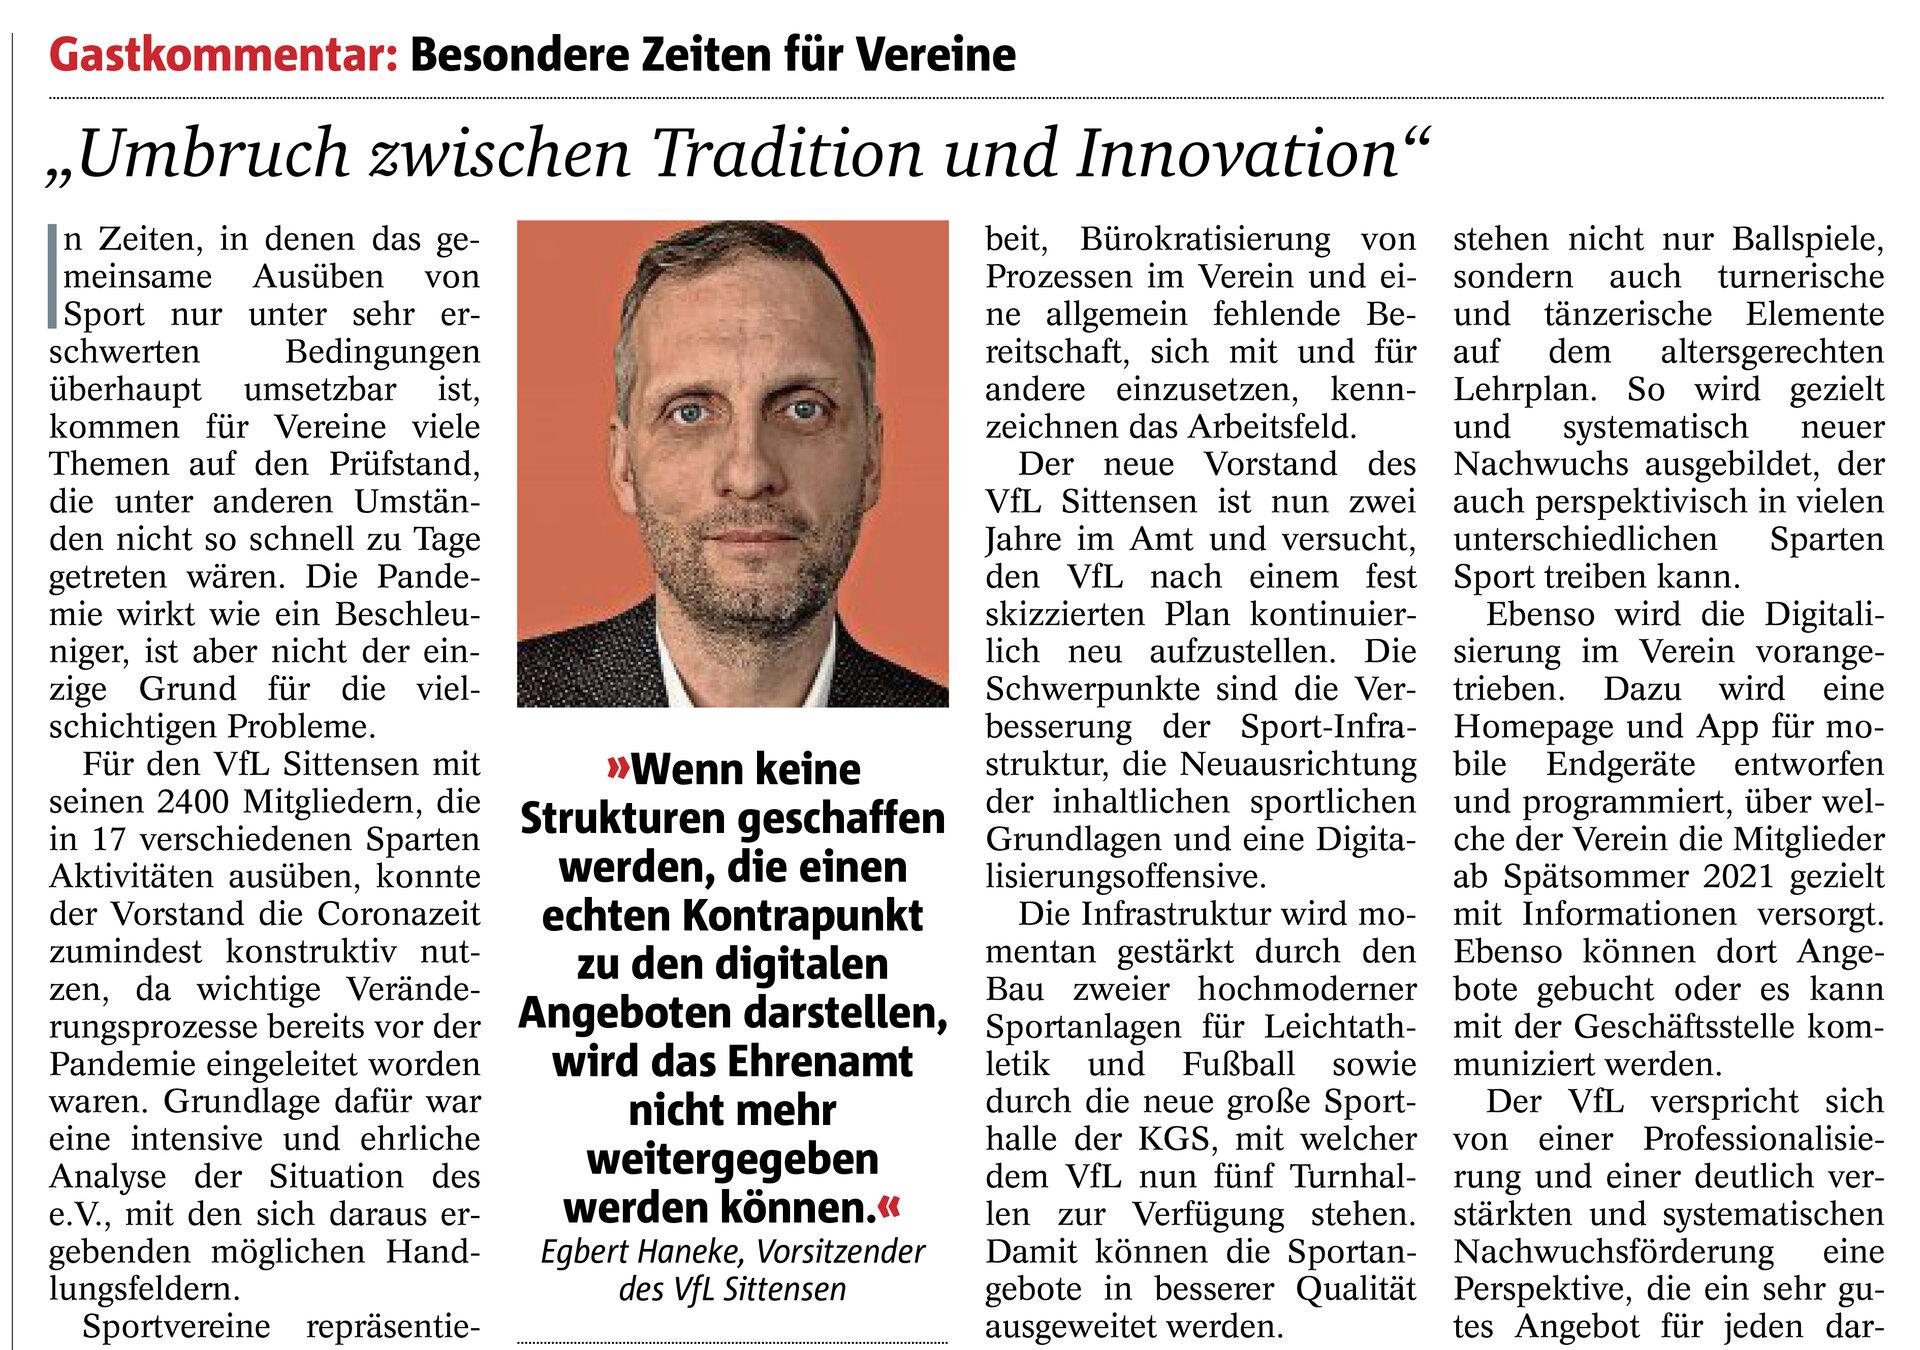 Zevener Zeitung Sonntagsjournal 30.5.2021